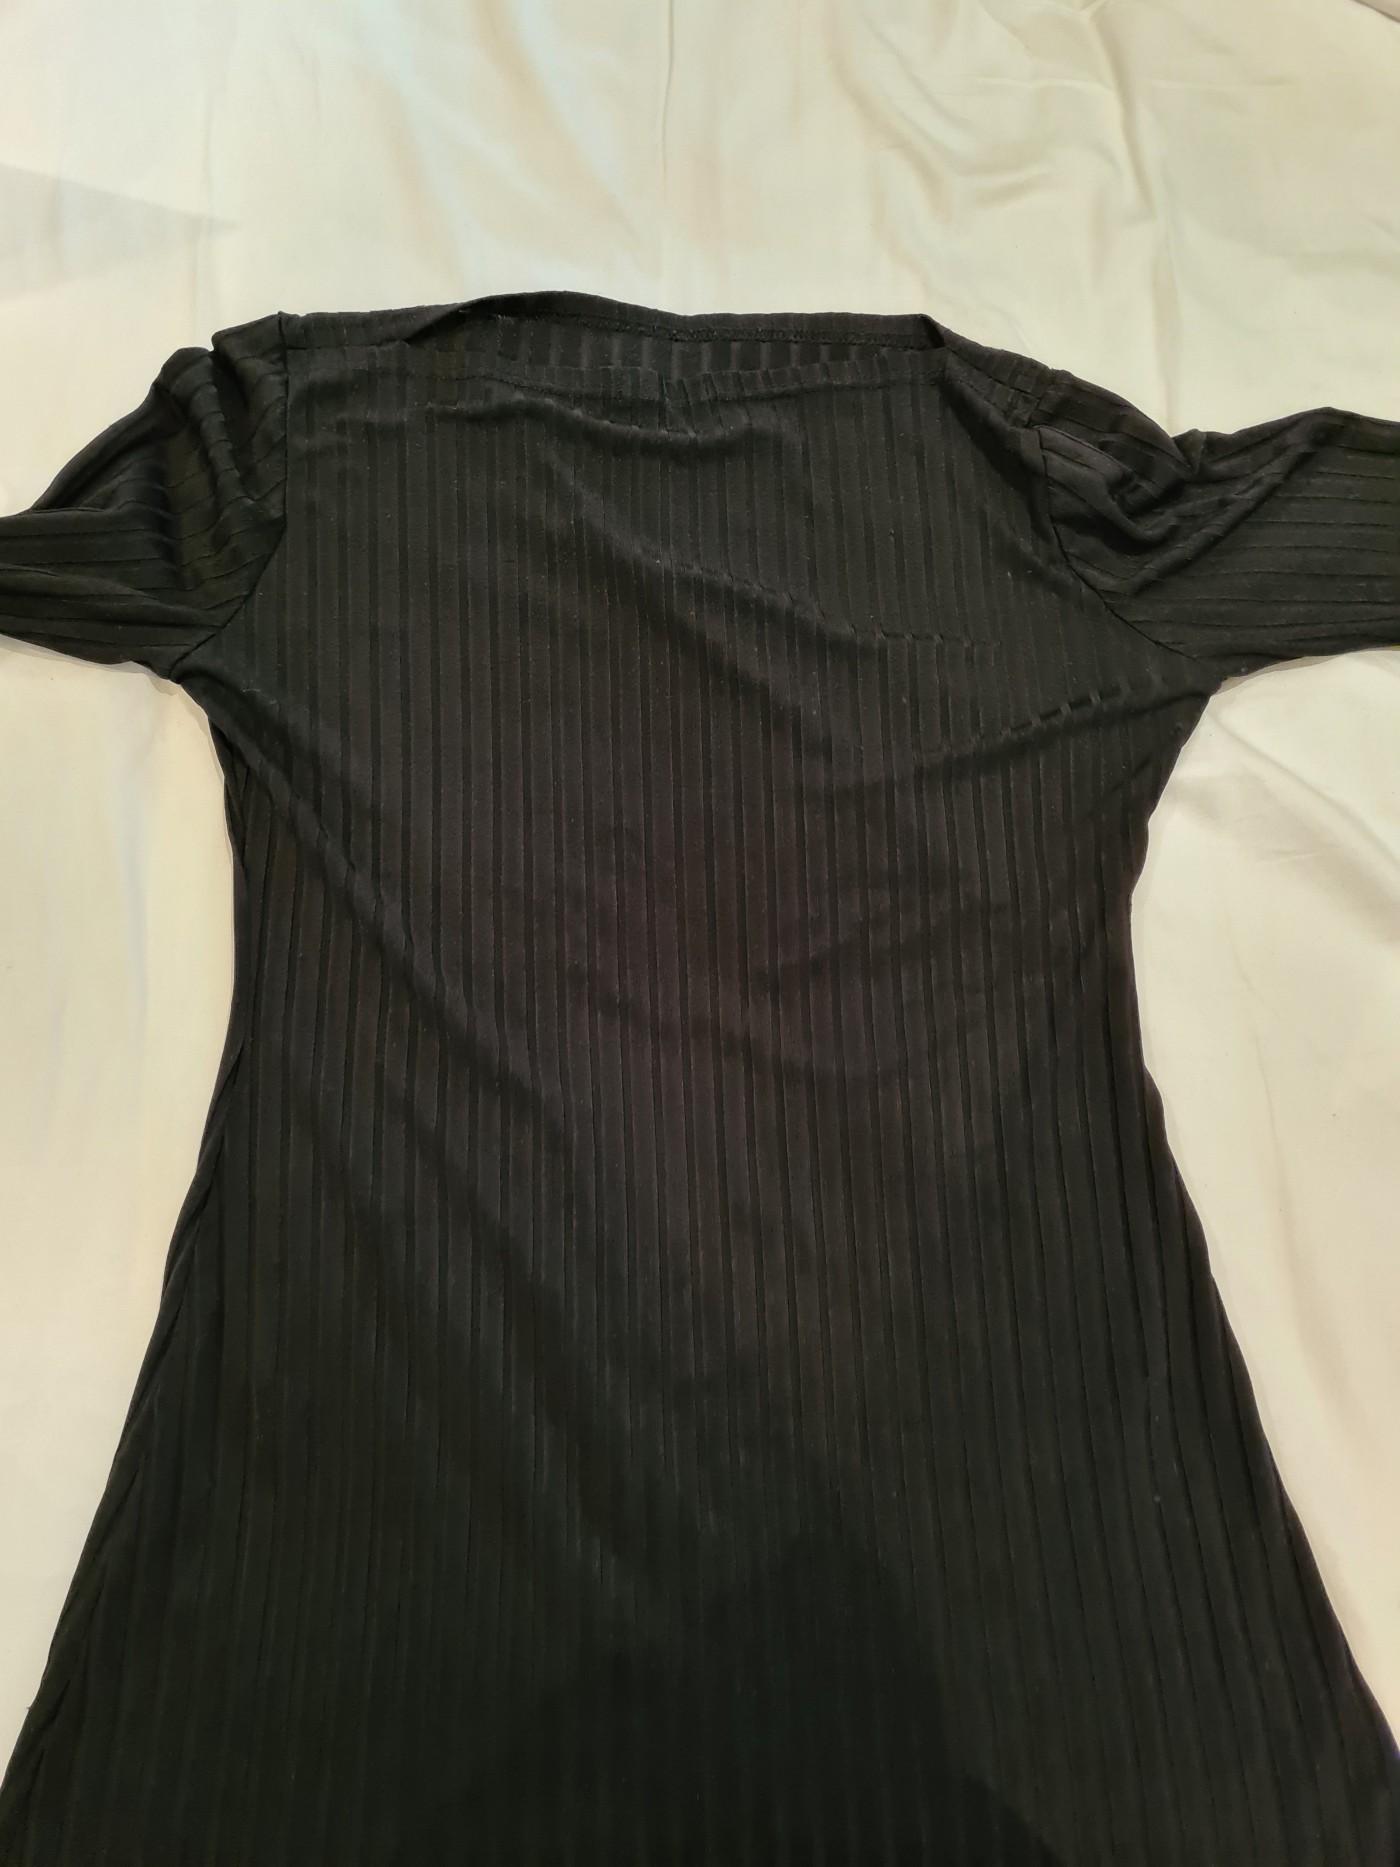 Black jumper size M